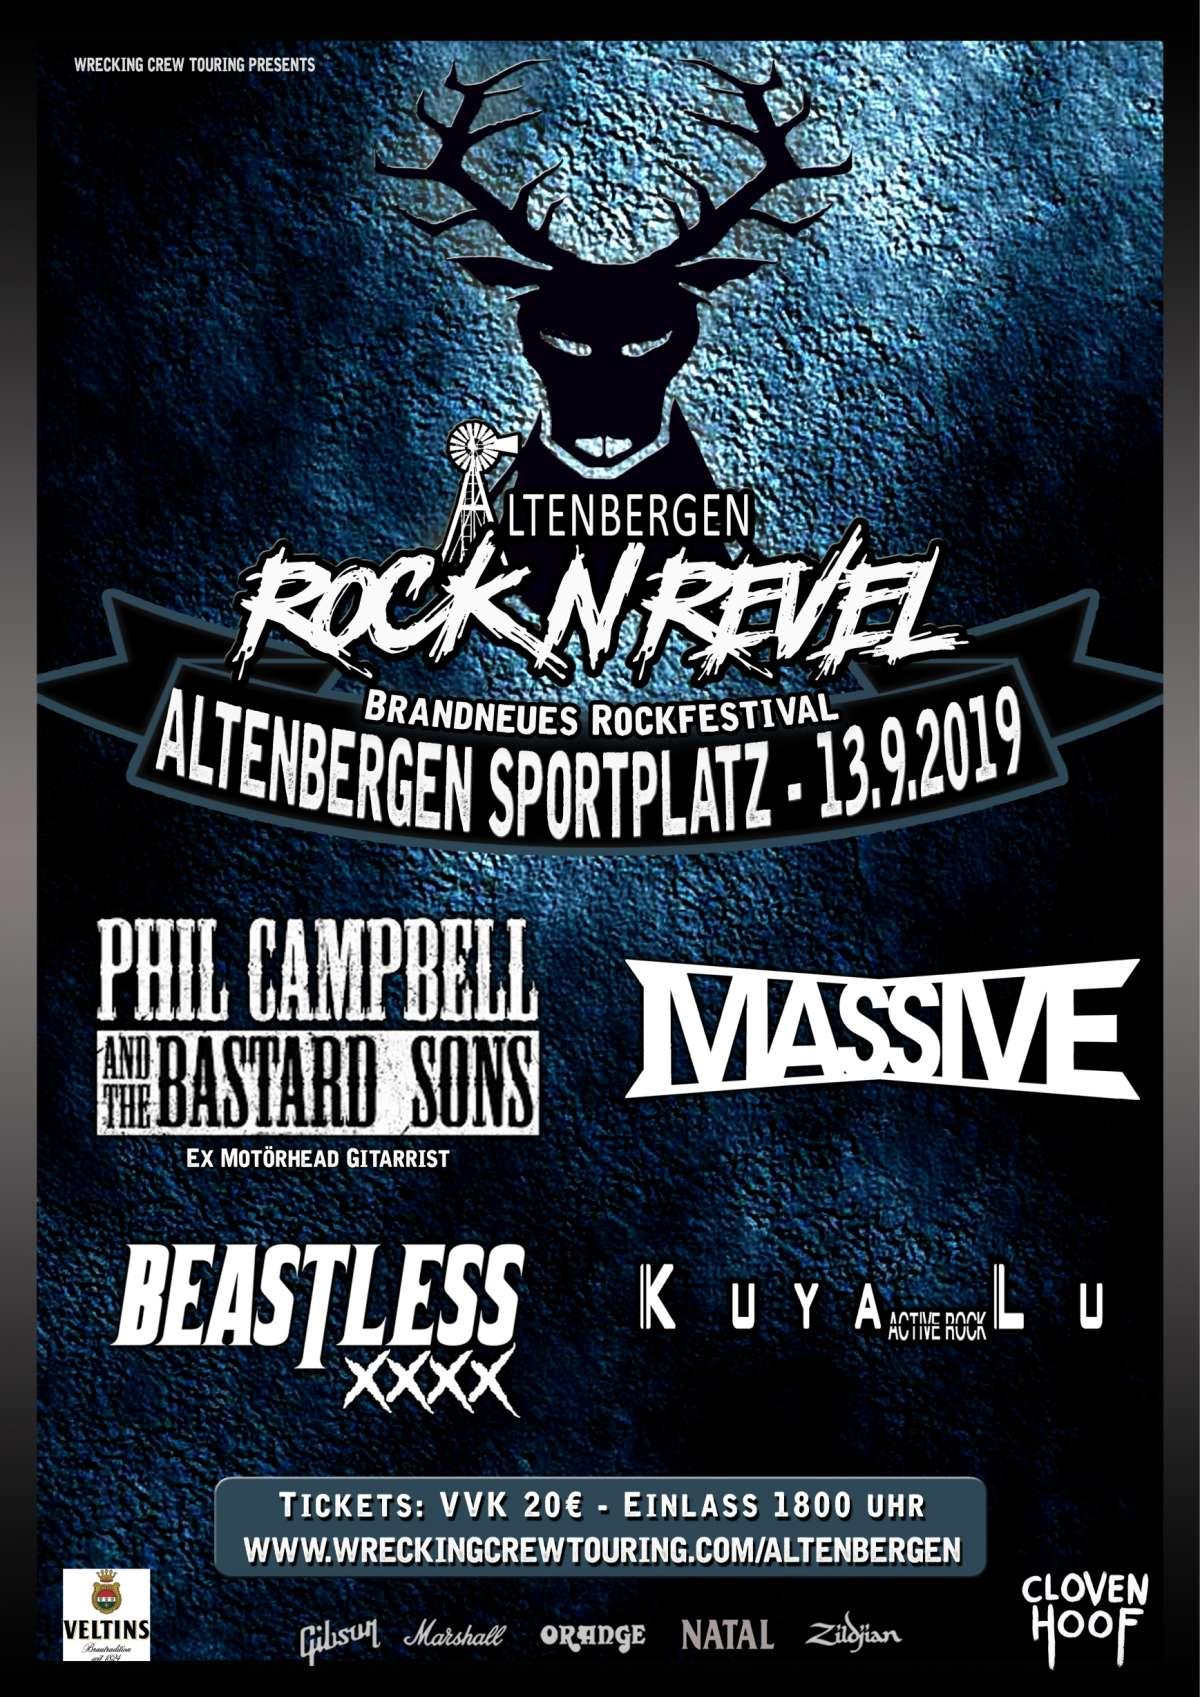 Altenbergen Rock 'N Revel - Phil Campbell and The Bastard Sons, Massive, Beastless, Kuya Lu - Sportplatz Altenbergen - Marienmünster-Altenbergen